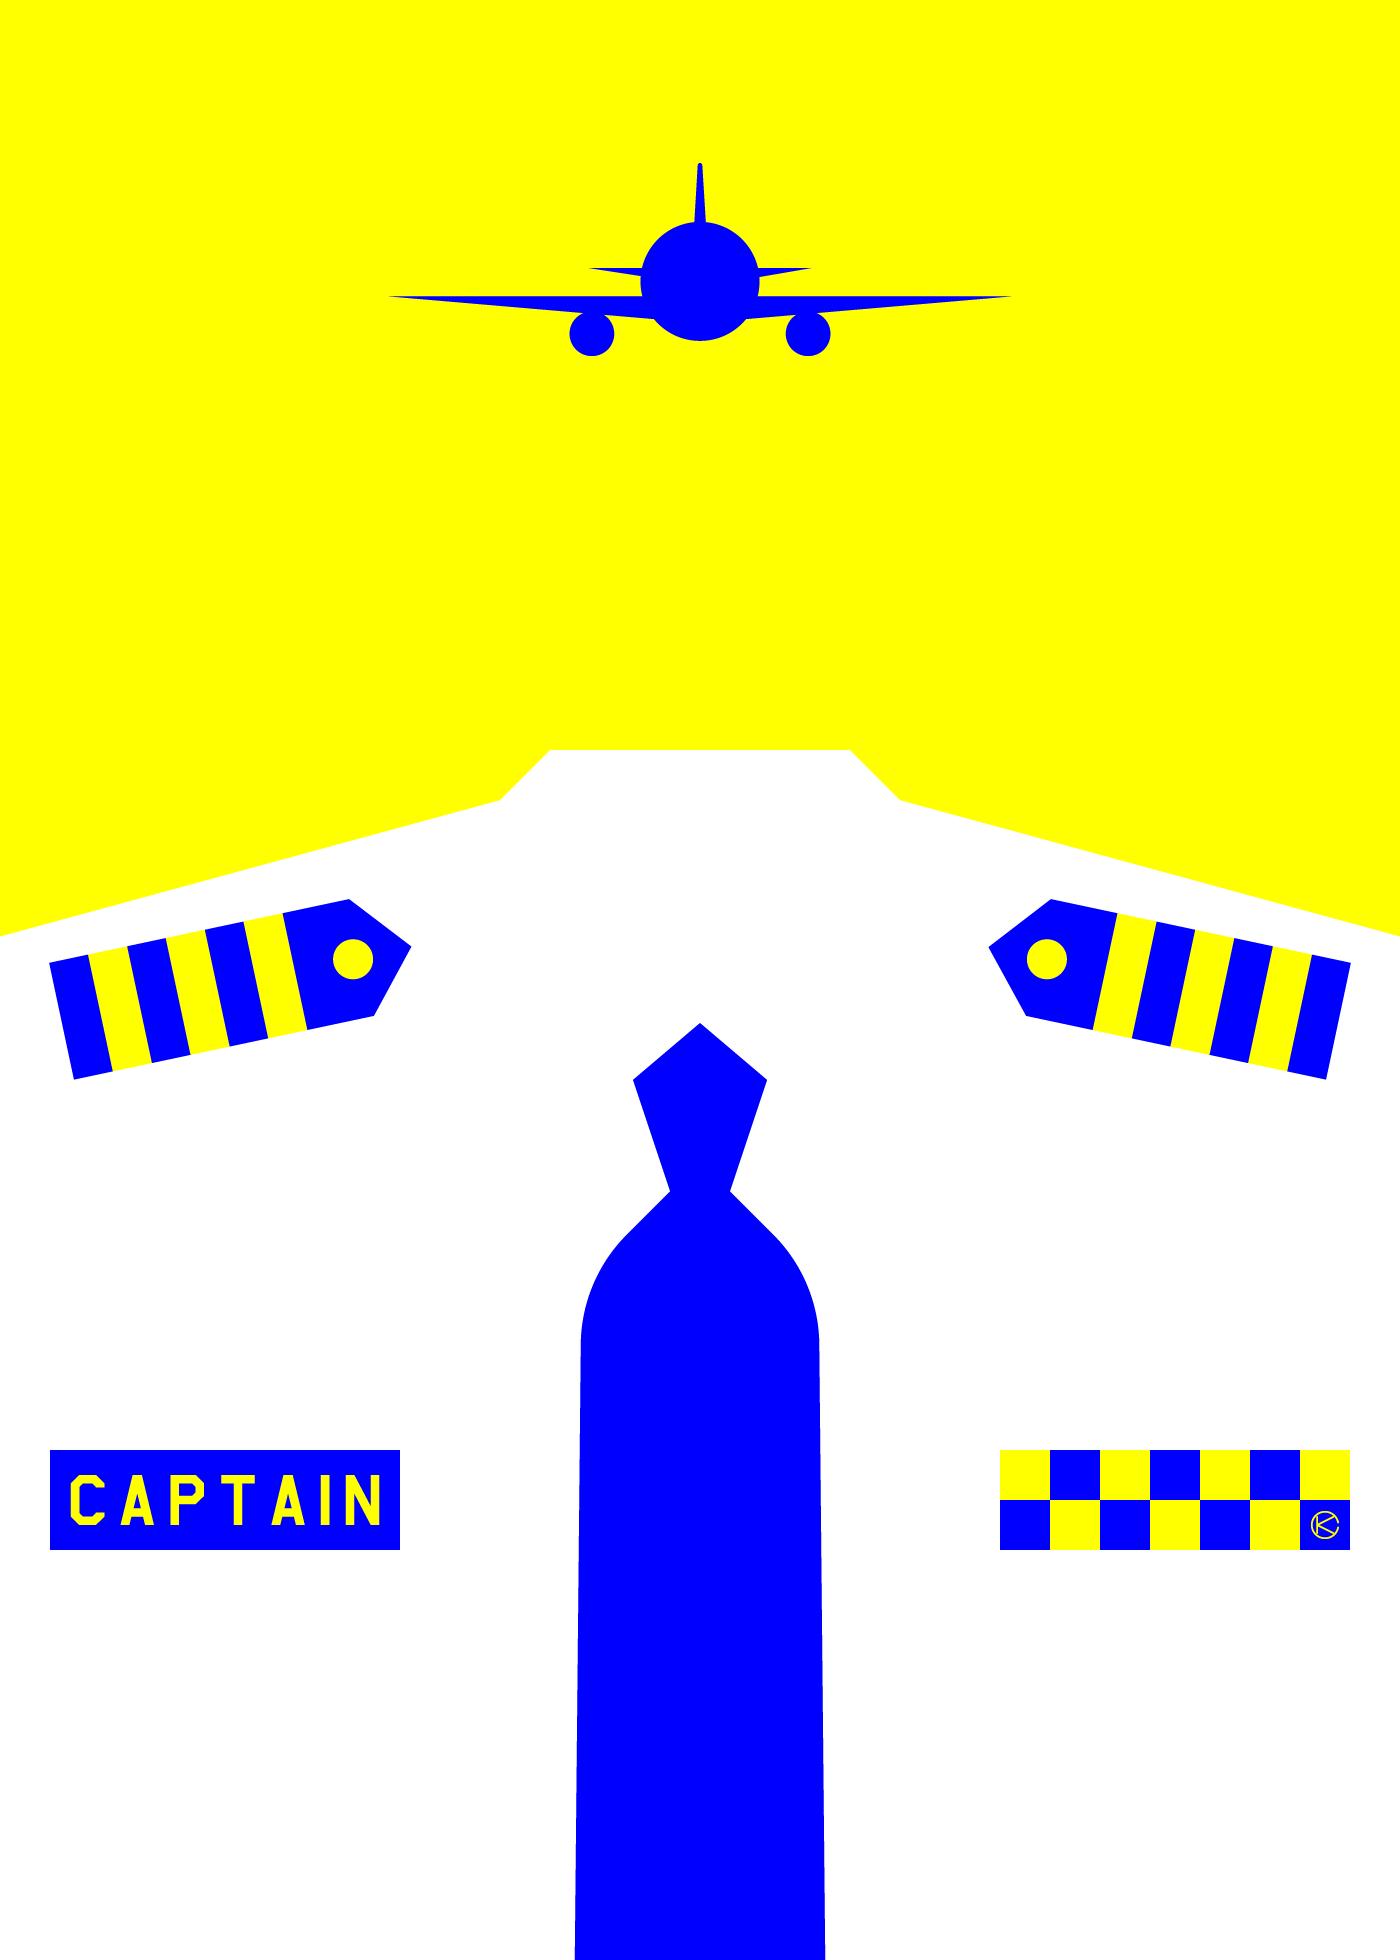 christian_kluge_captain_1